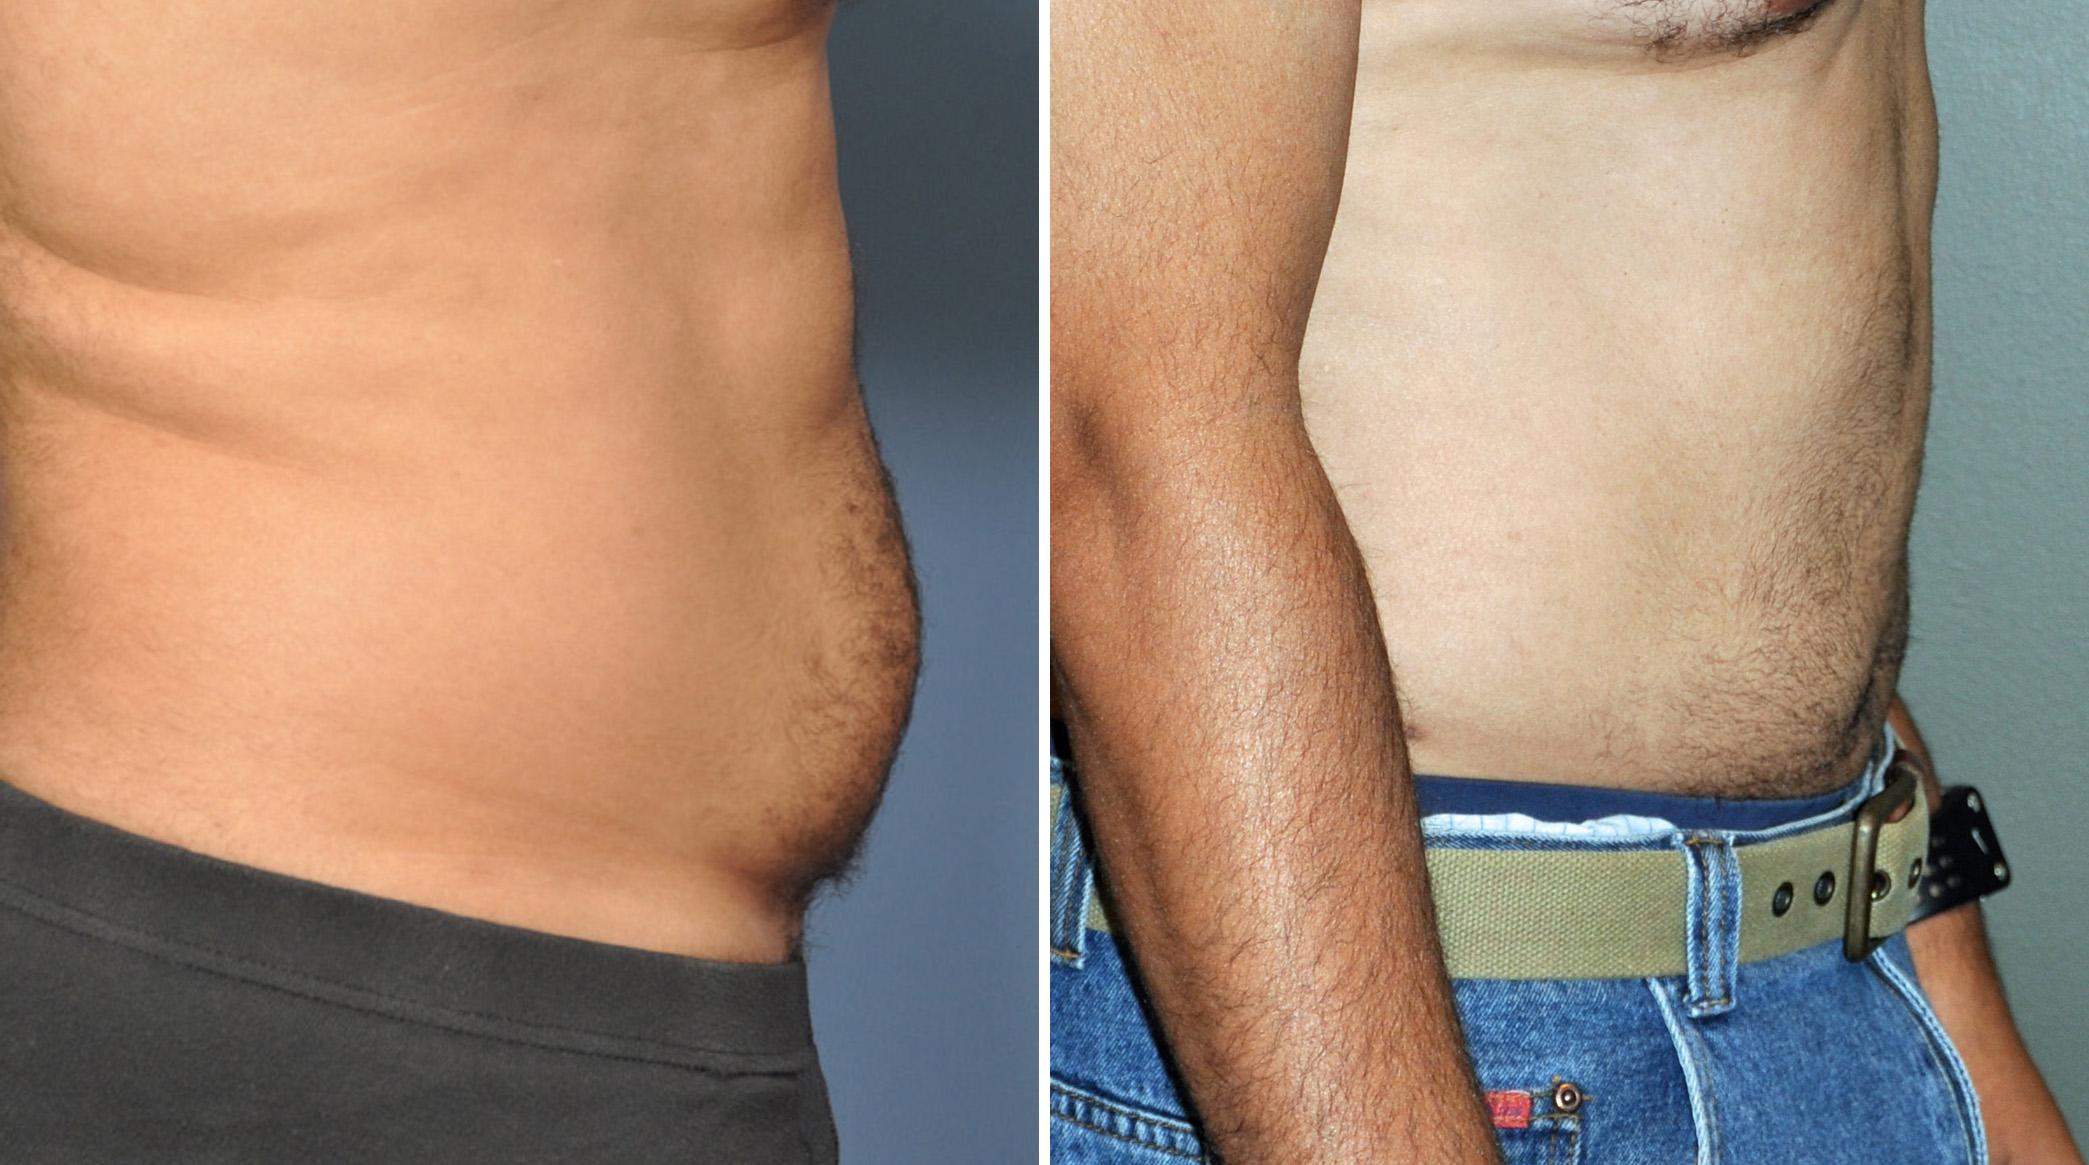 Liposuction surgery - Stock Image - M590/0350 - Science